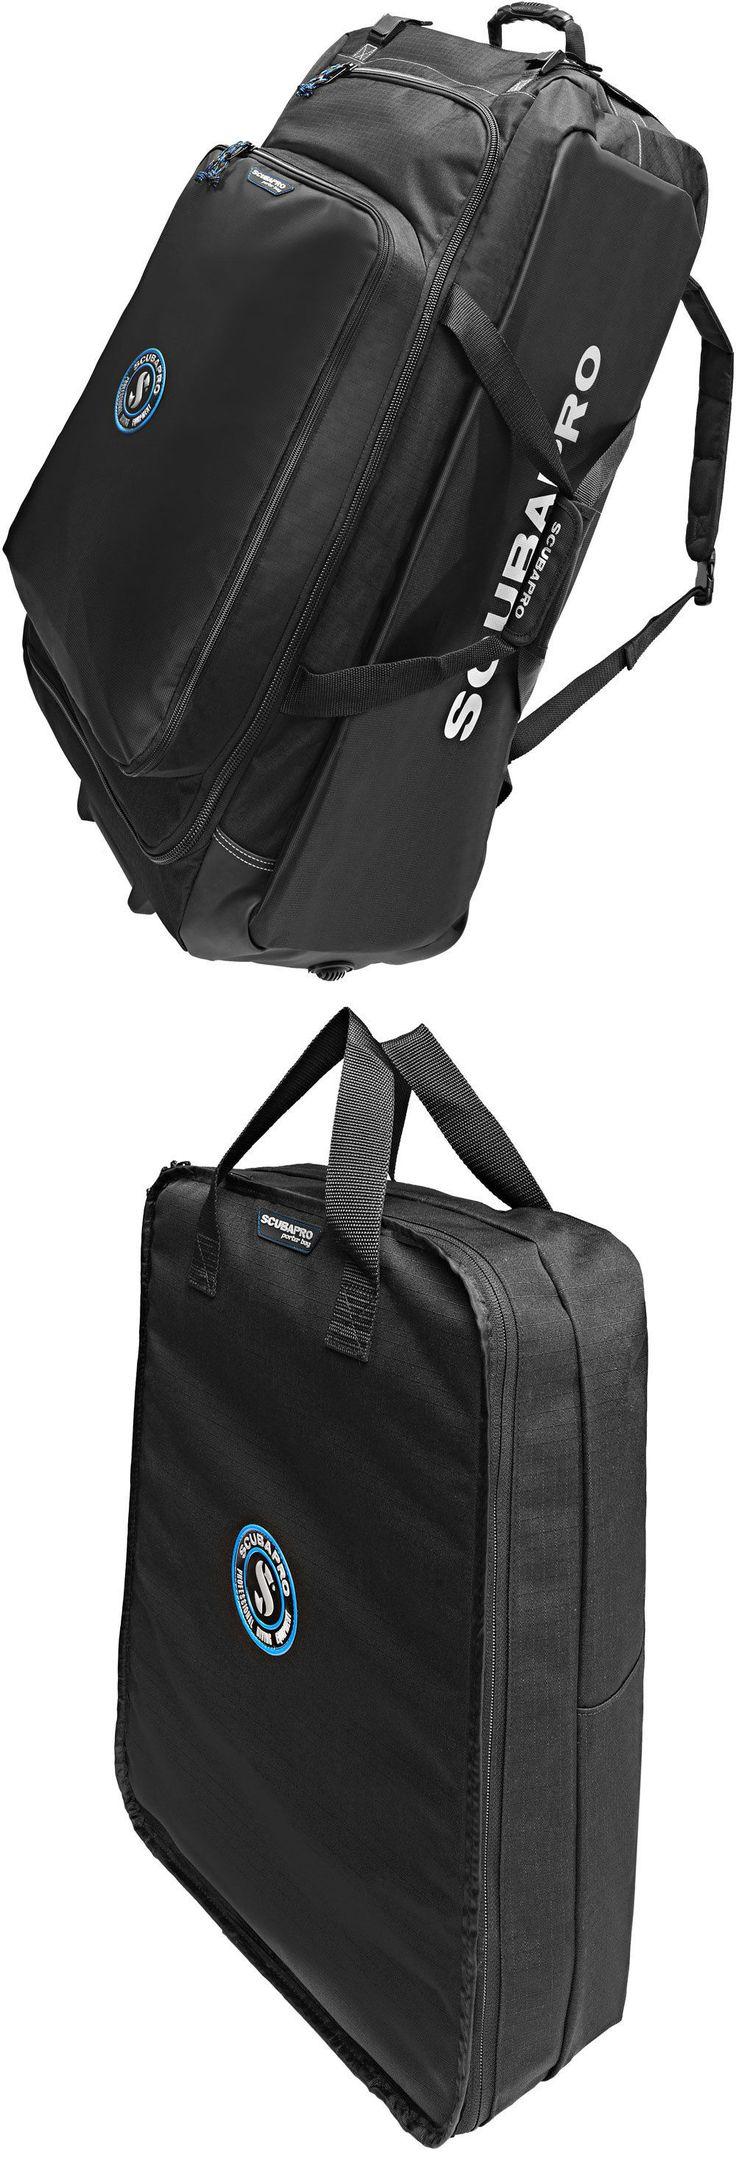 Best 25 nitrox diving ideas on pinterest for Dive gear bag